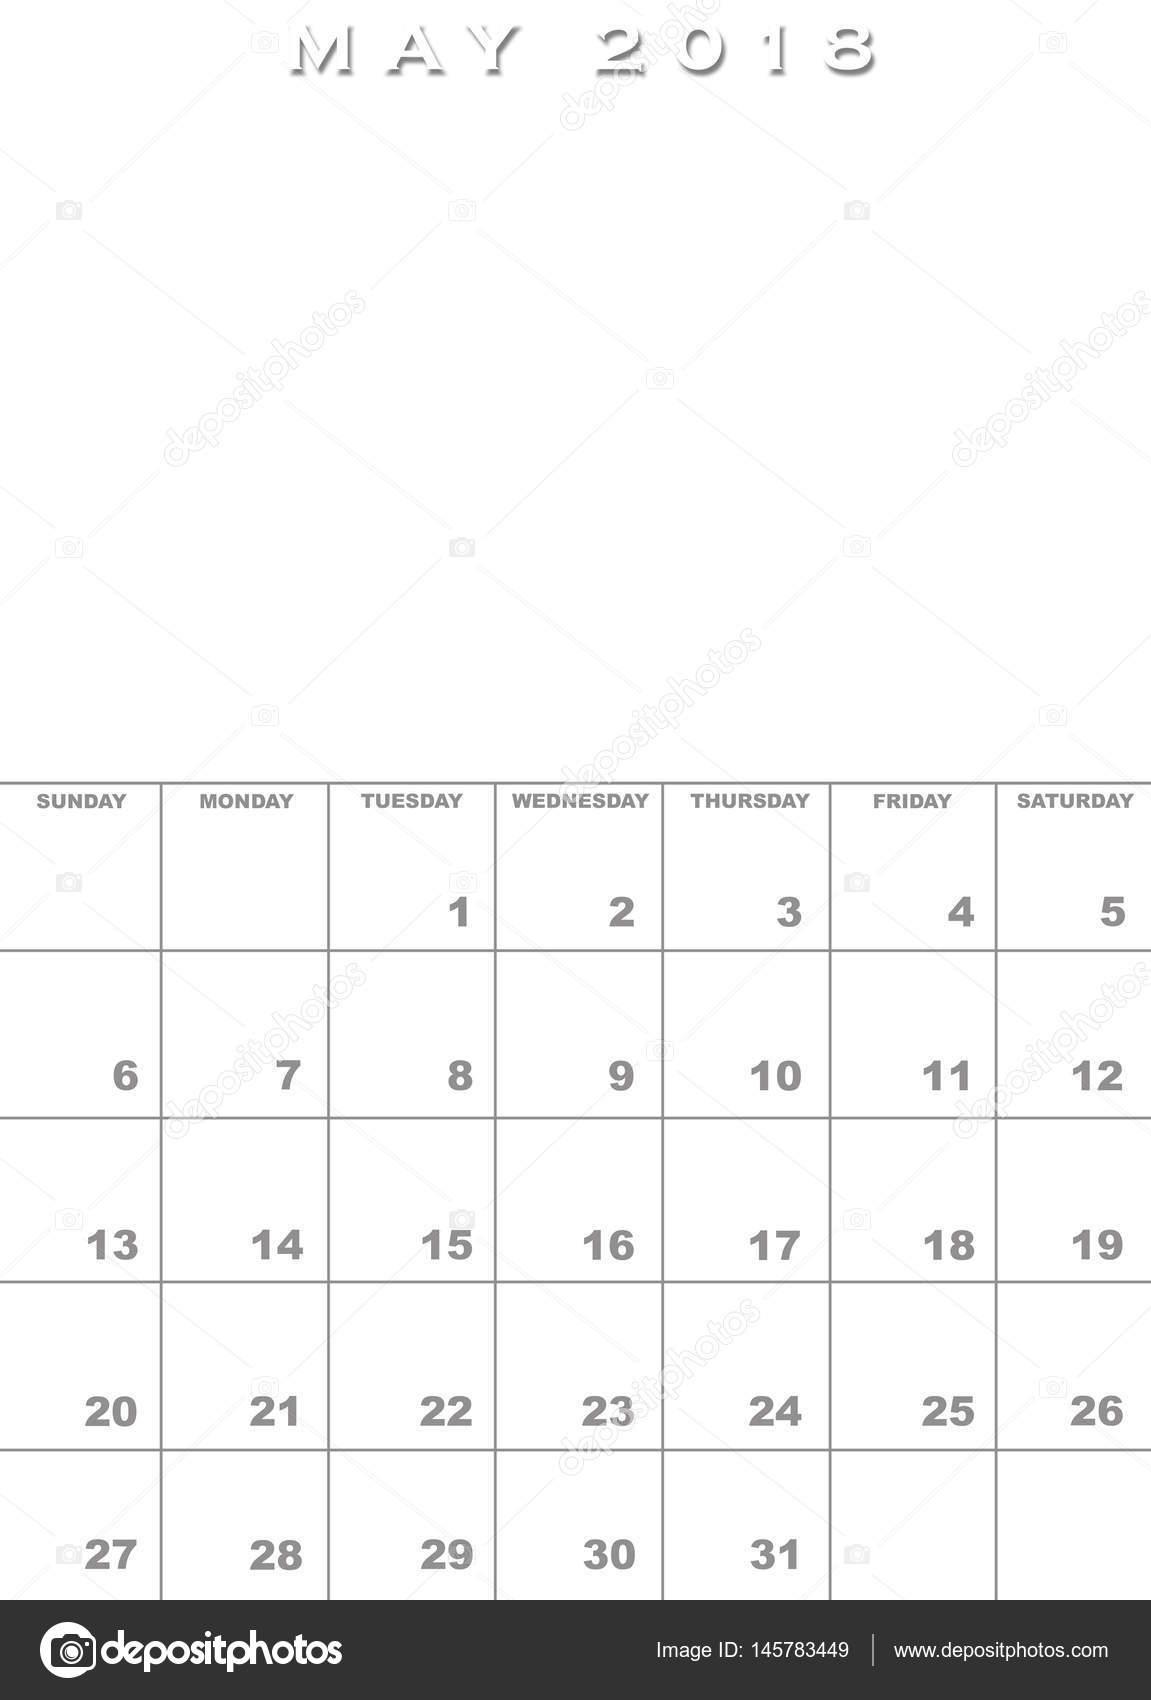 May 2018 calendar template stock photo paulvinten 145783449 may 2018 calendar template stock photo 145783449 pronofoot35fo Images